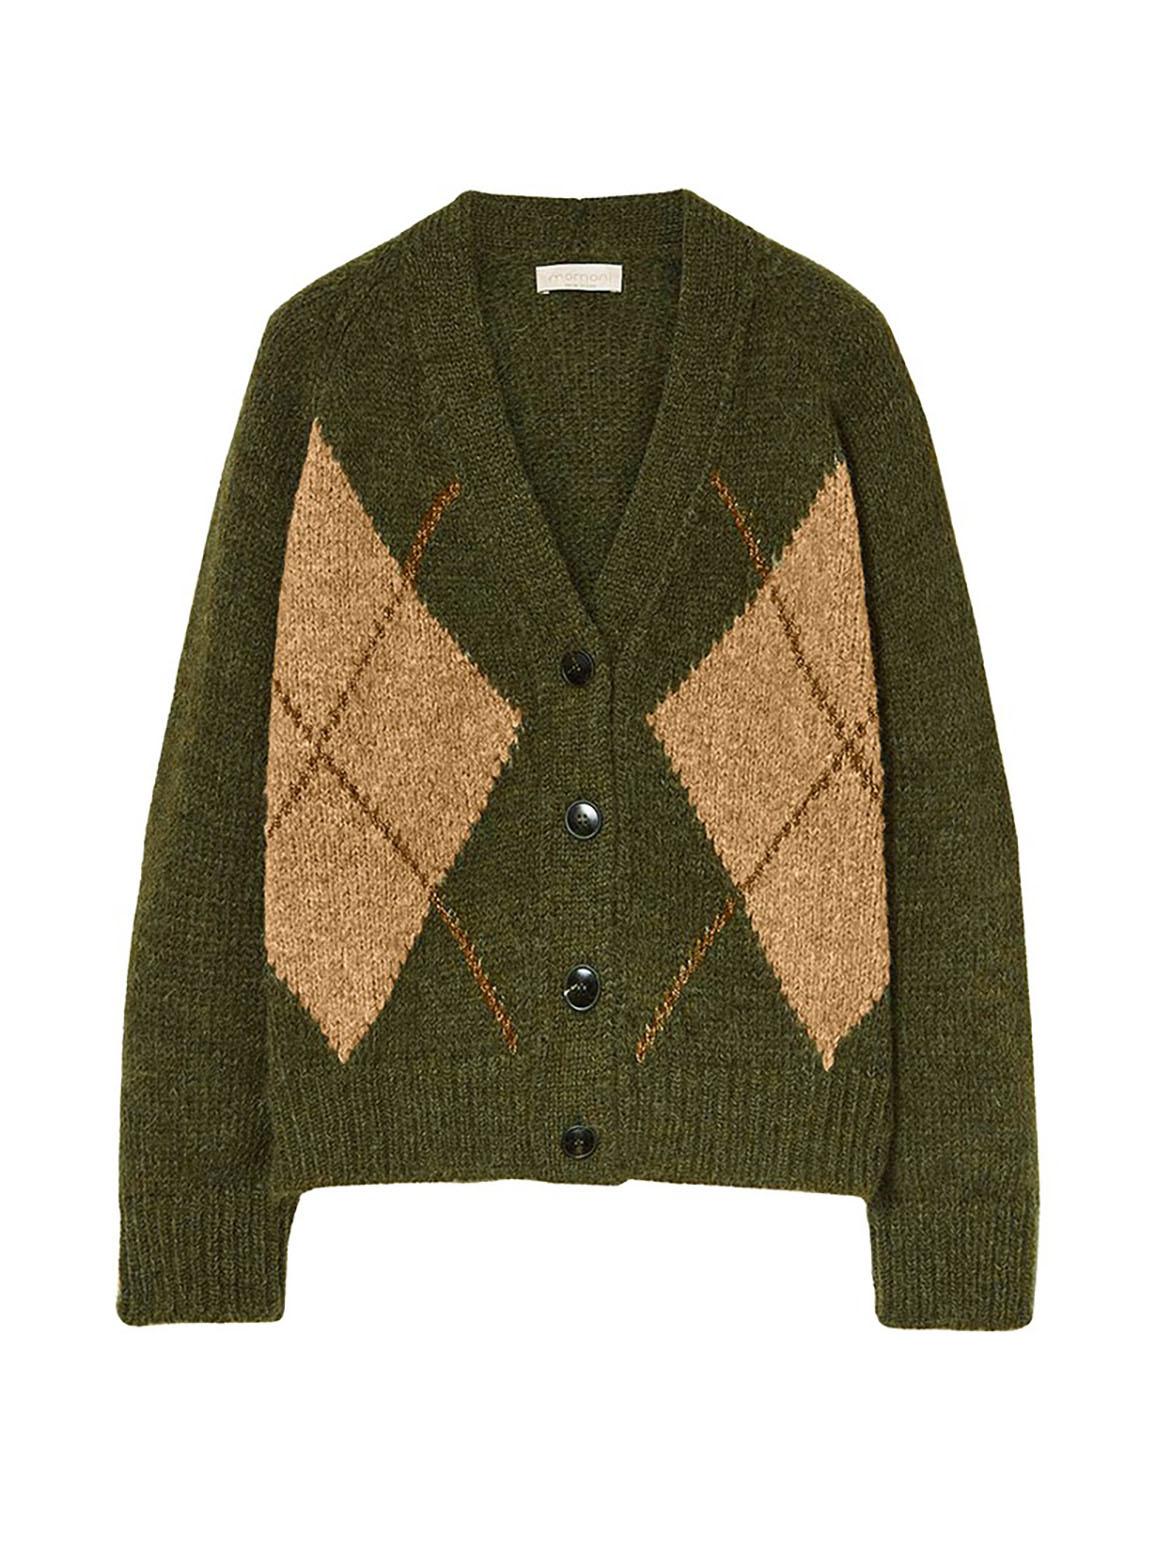 Oliver Knit In Alpaca/Cashmere